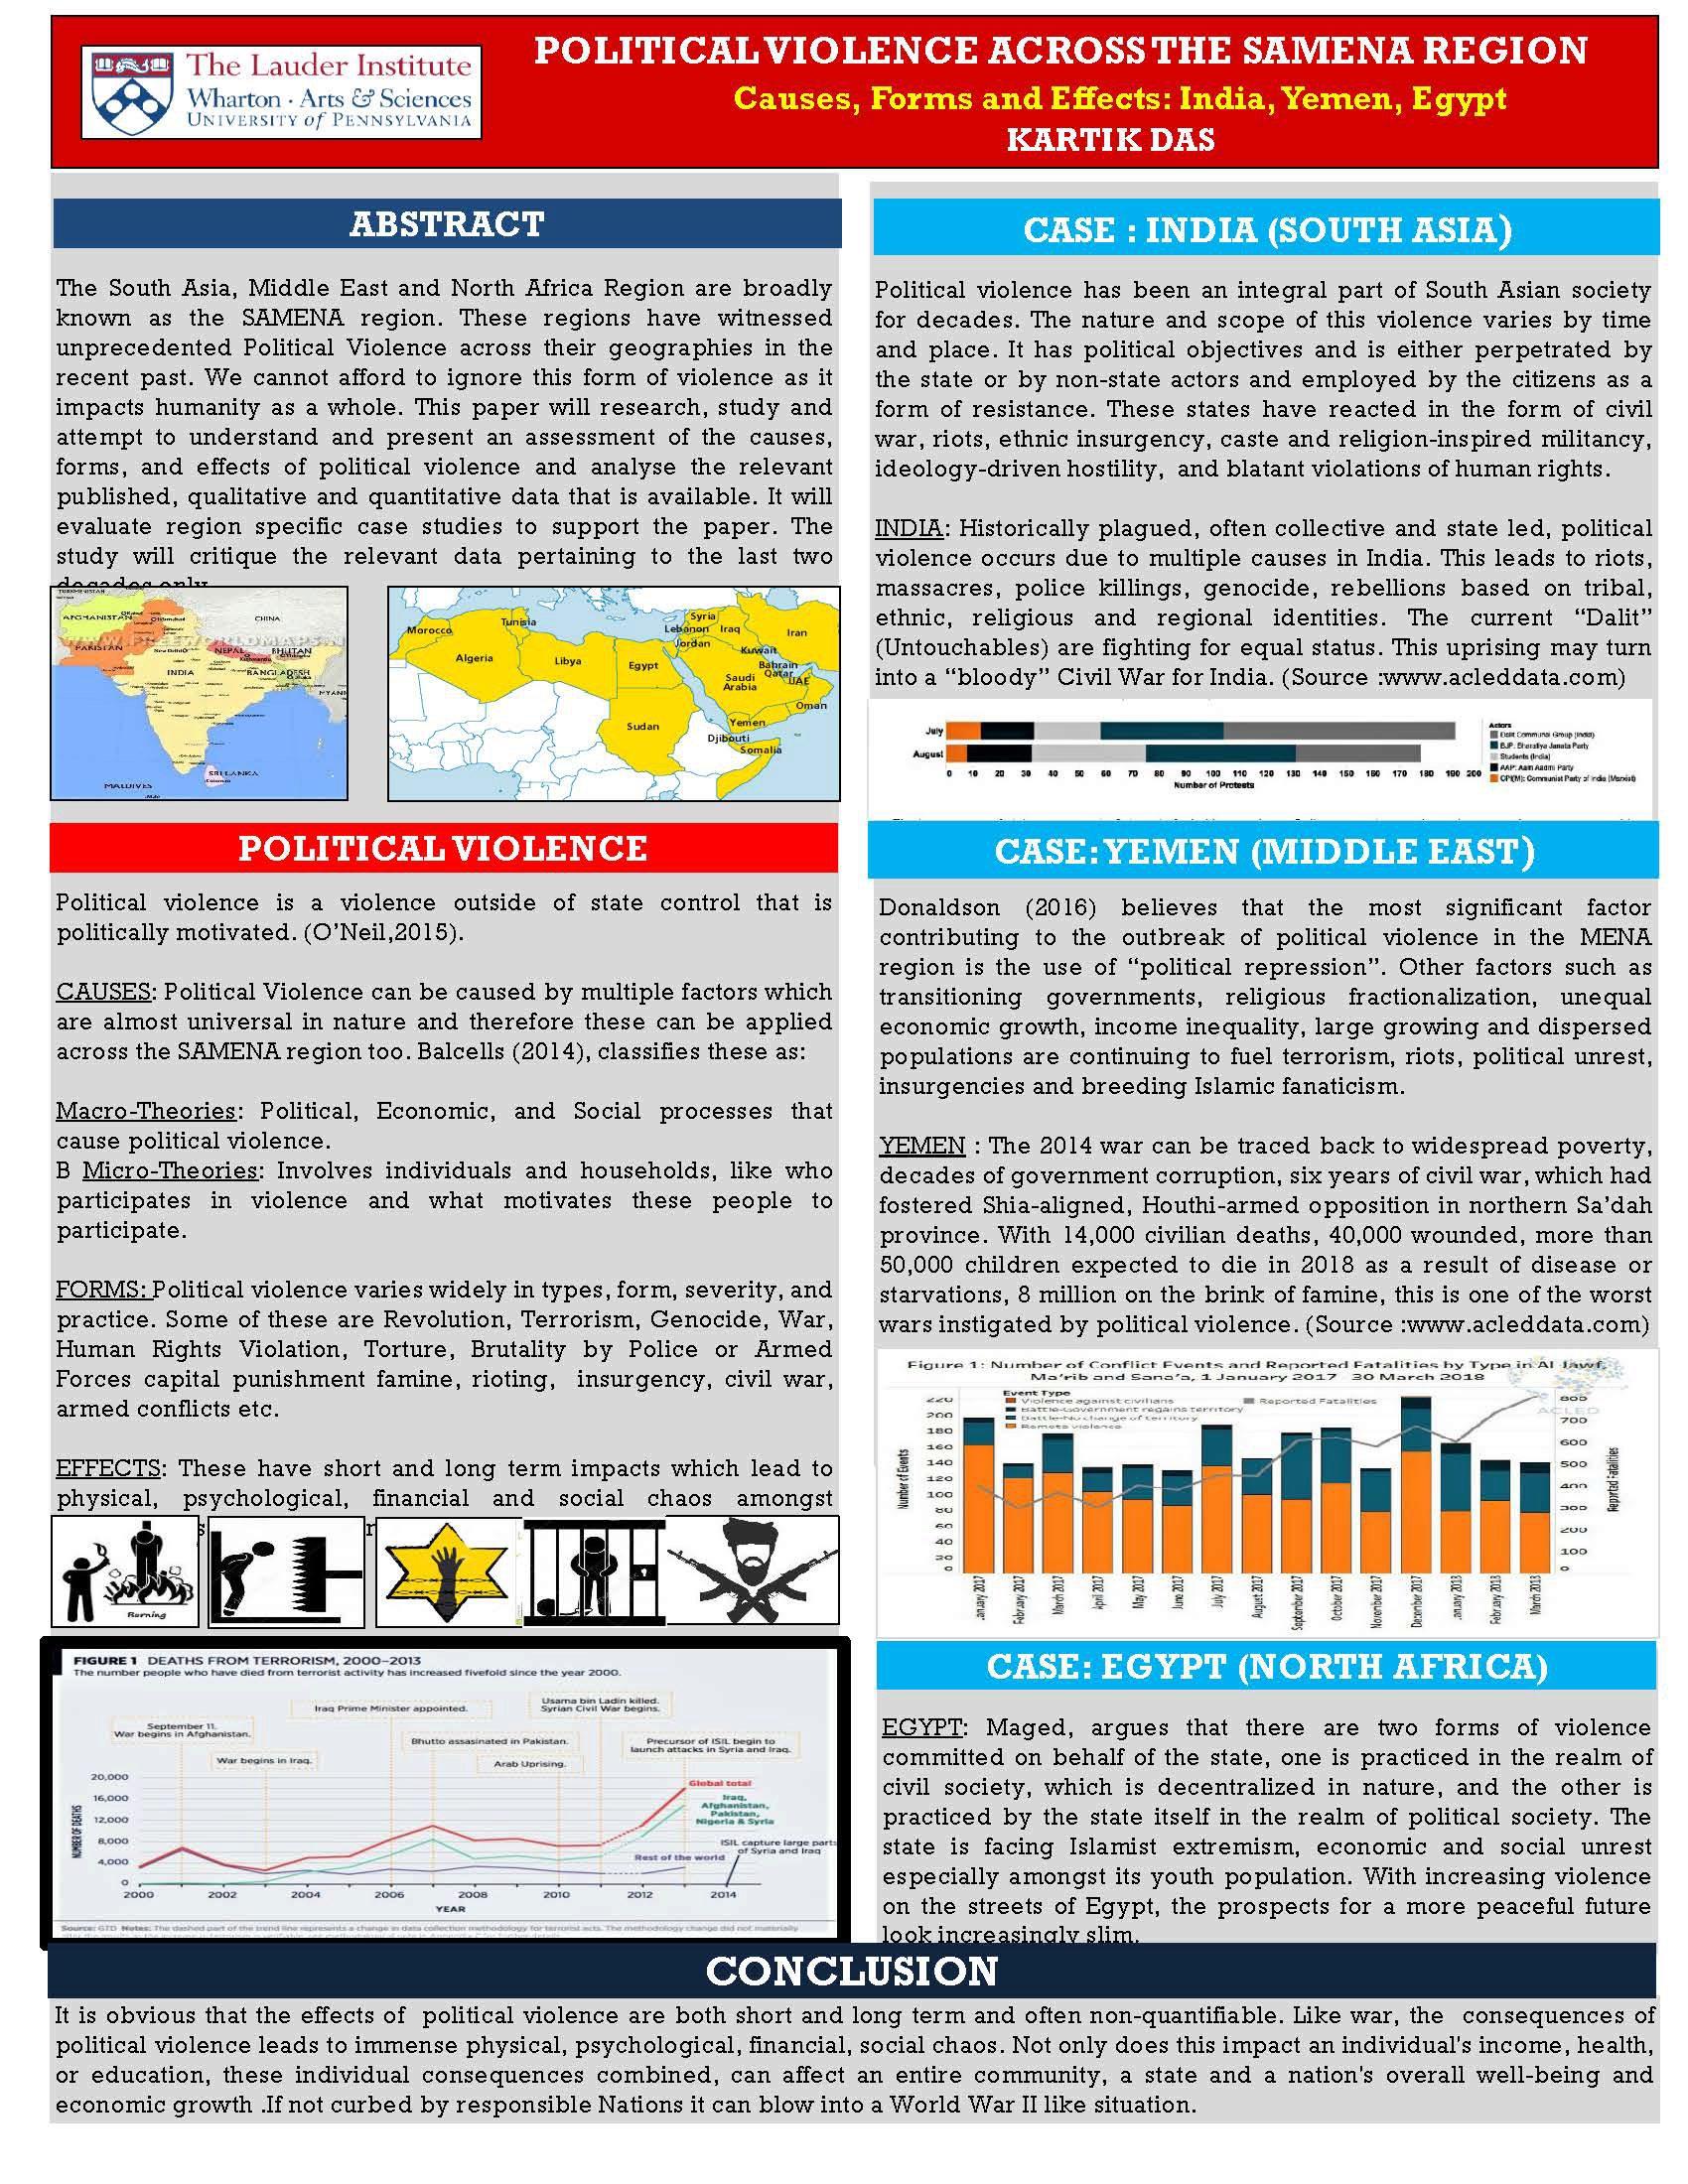 Political Violence Across the SAMENA Region